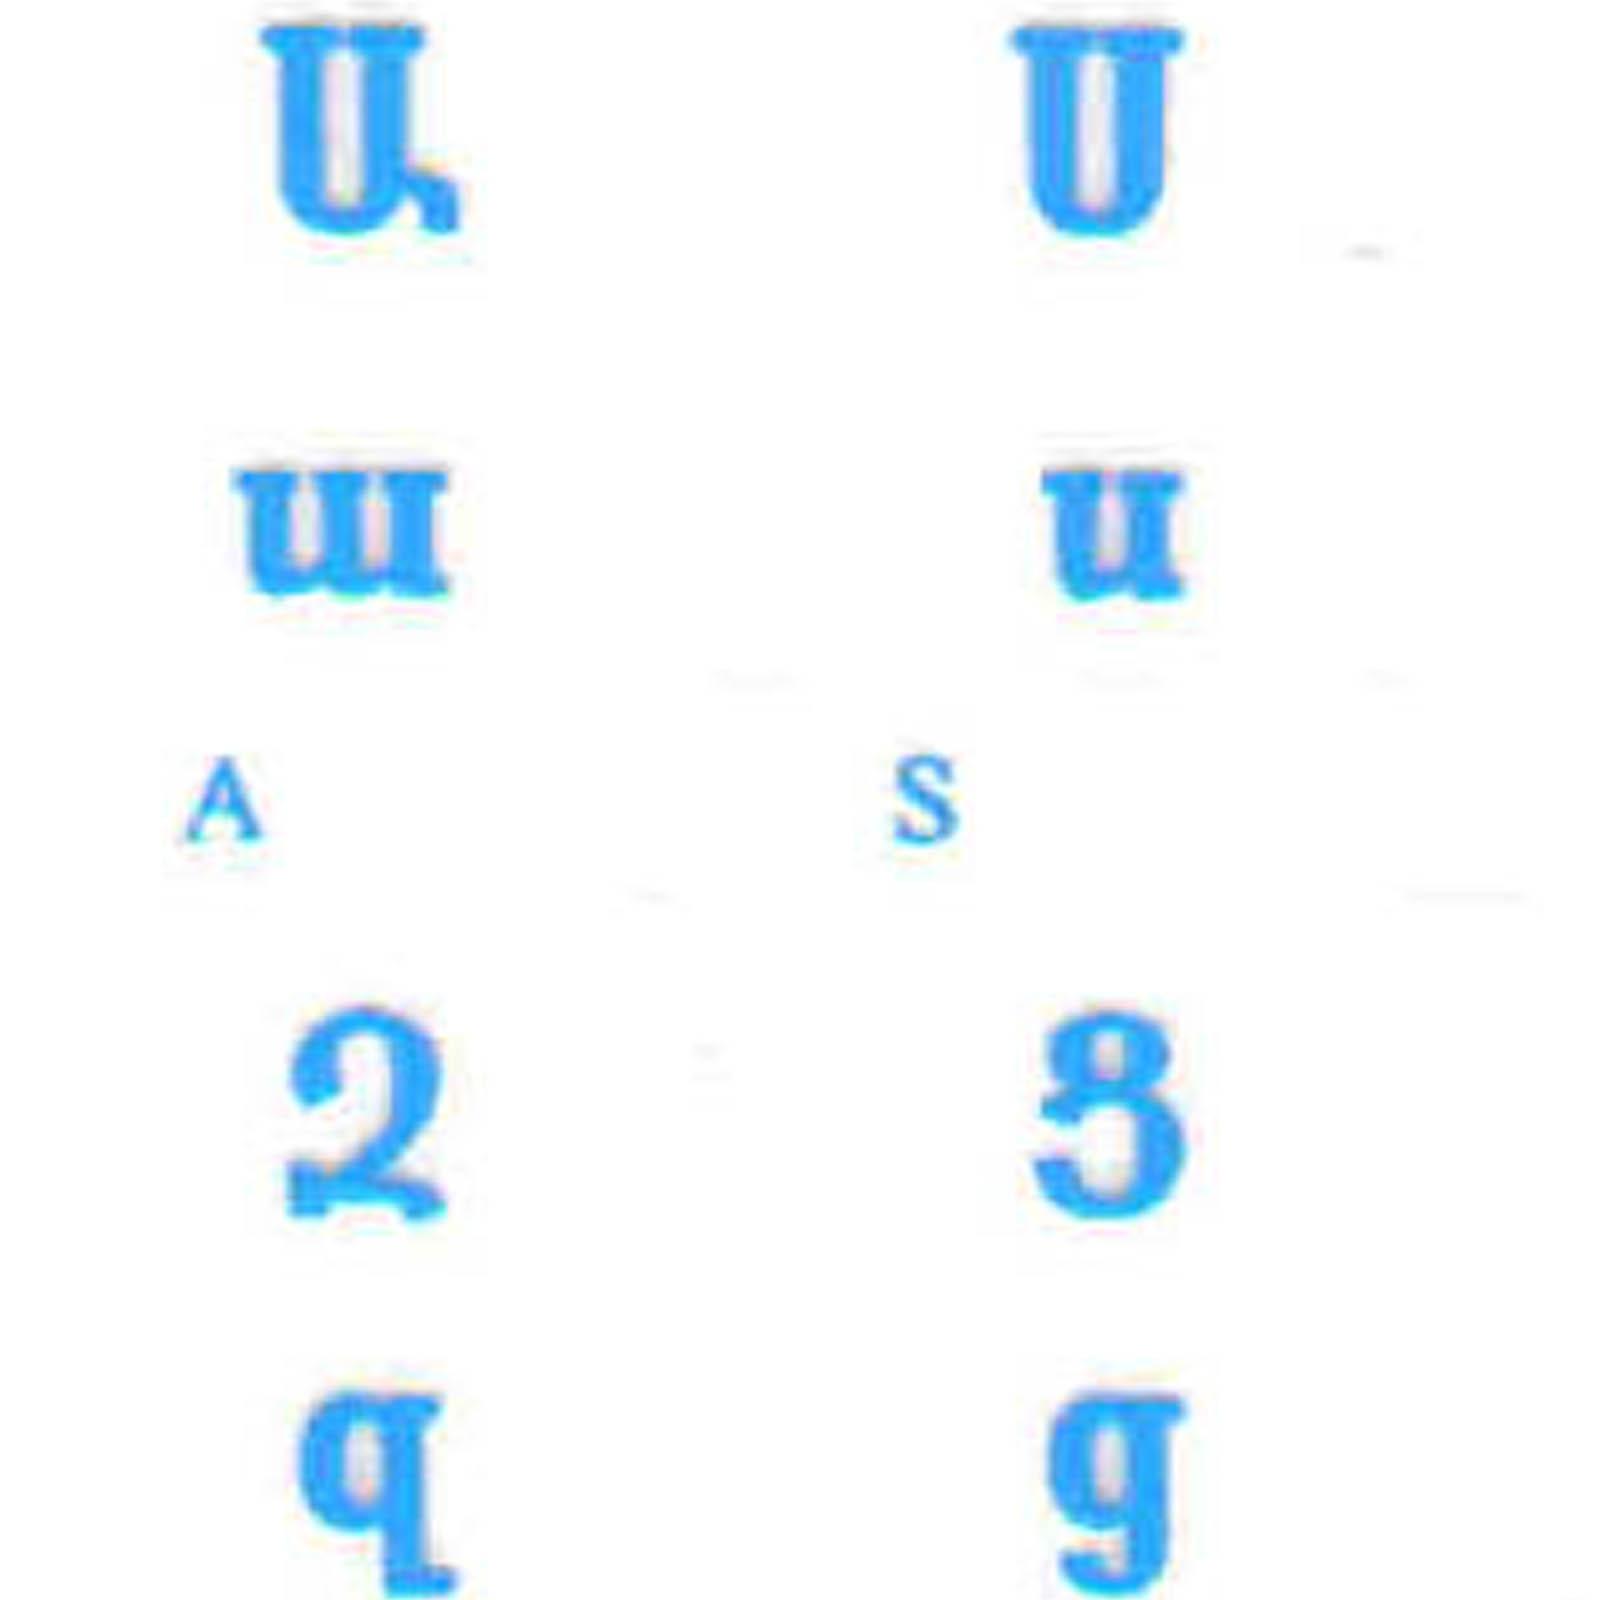 ARMENIAN KEYBOARD STICKERS BLUE LETTERS TRANSPARENT